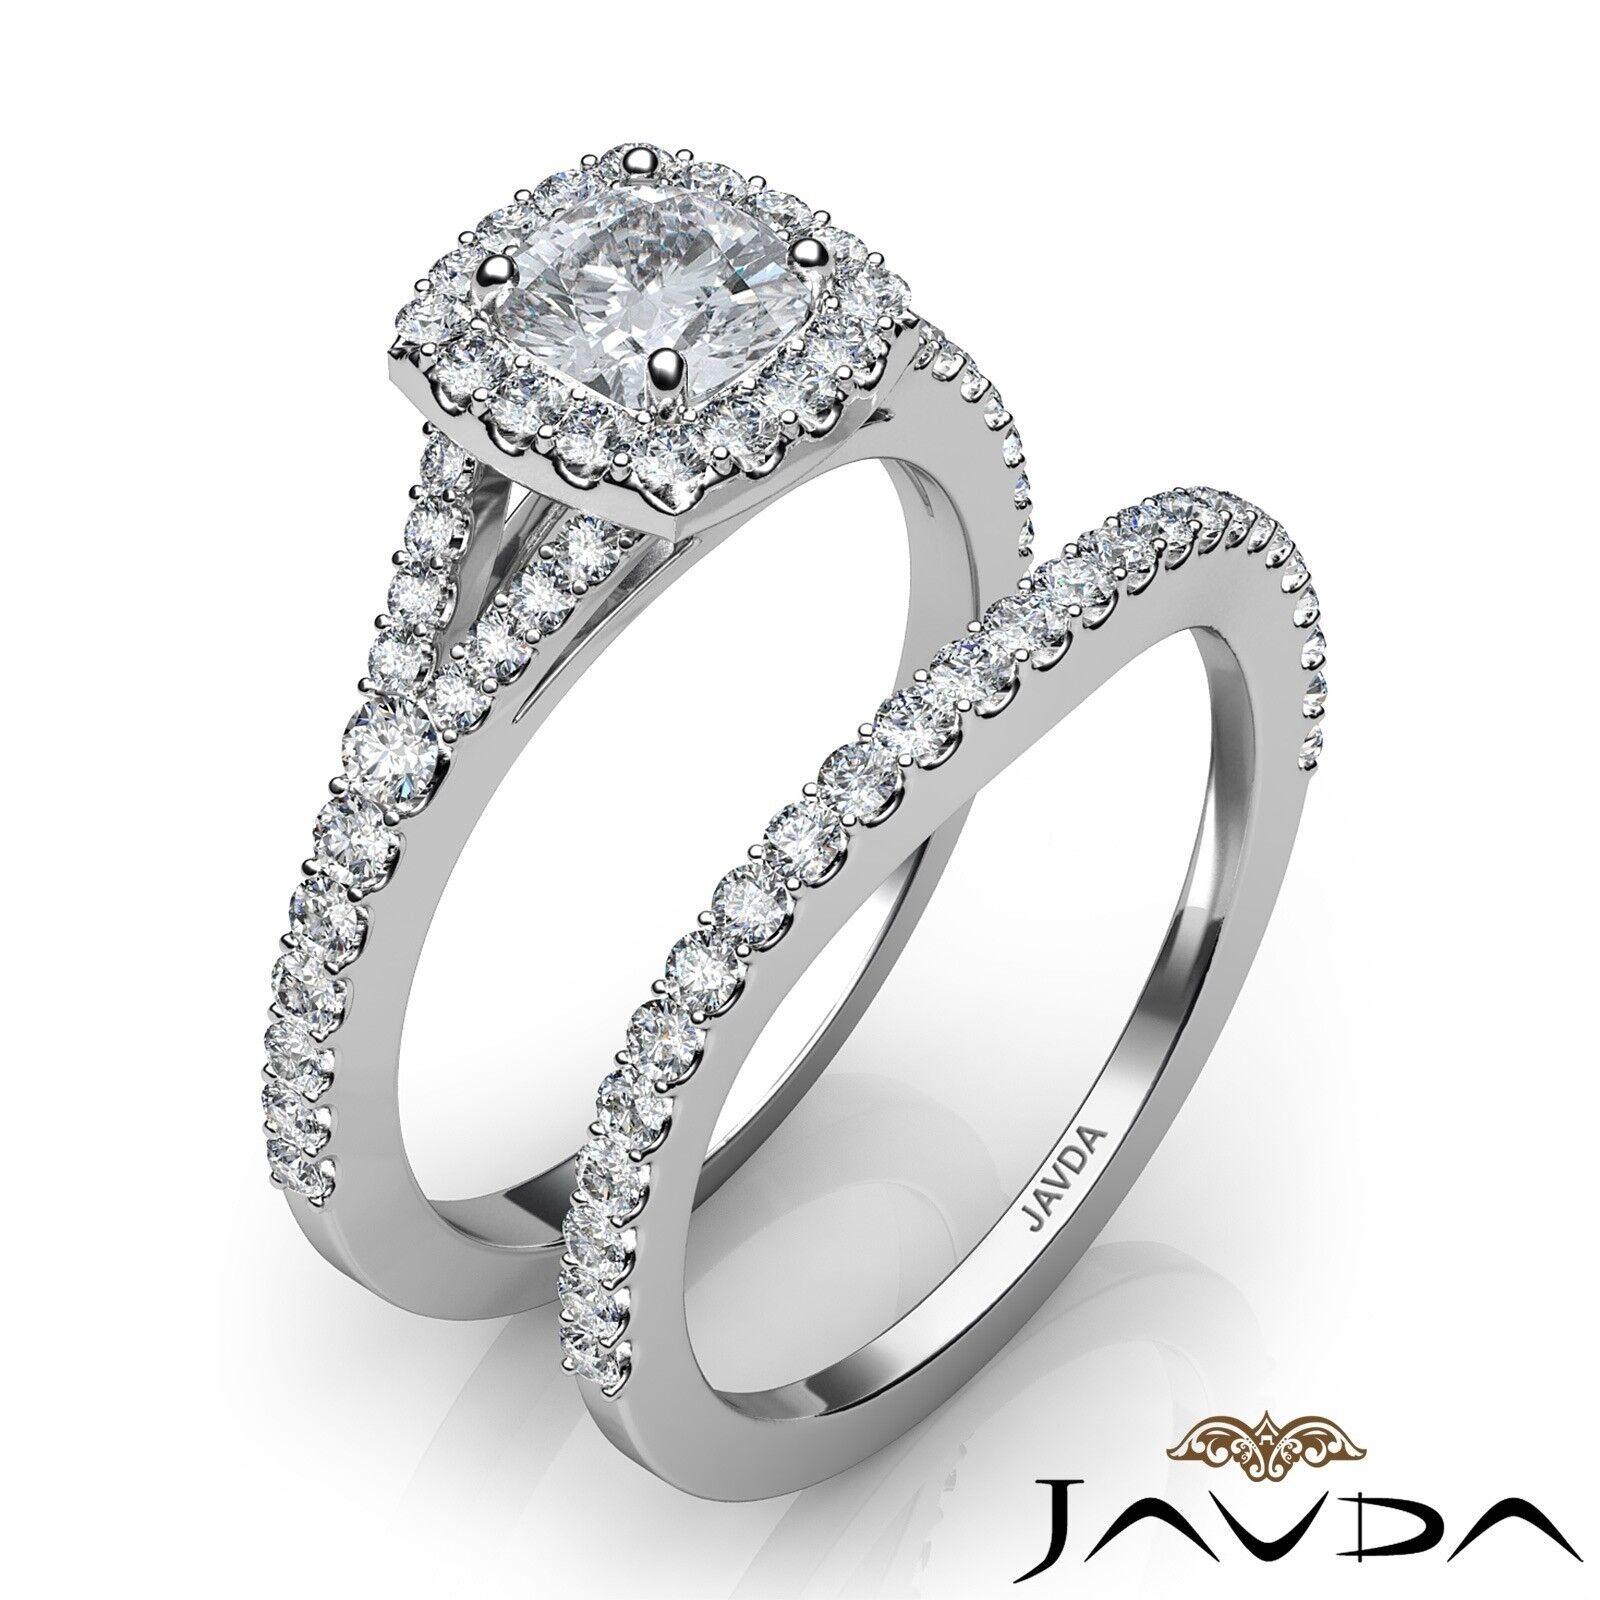 1.5ctw U Cut Pave Halo Bridal Cushion Diamond Engagement Ring GIA F-VS2 W Gold 2